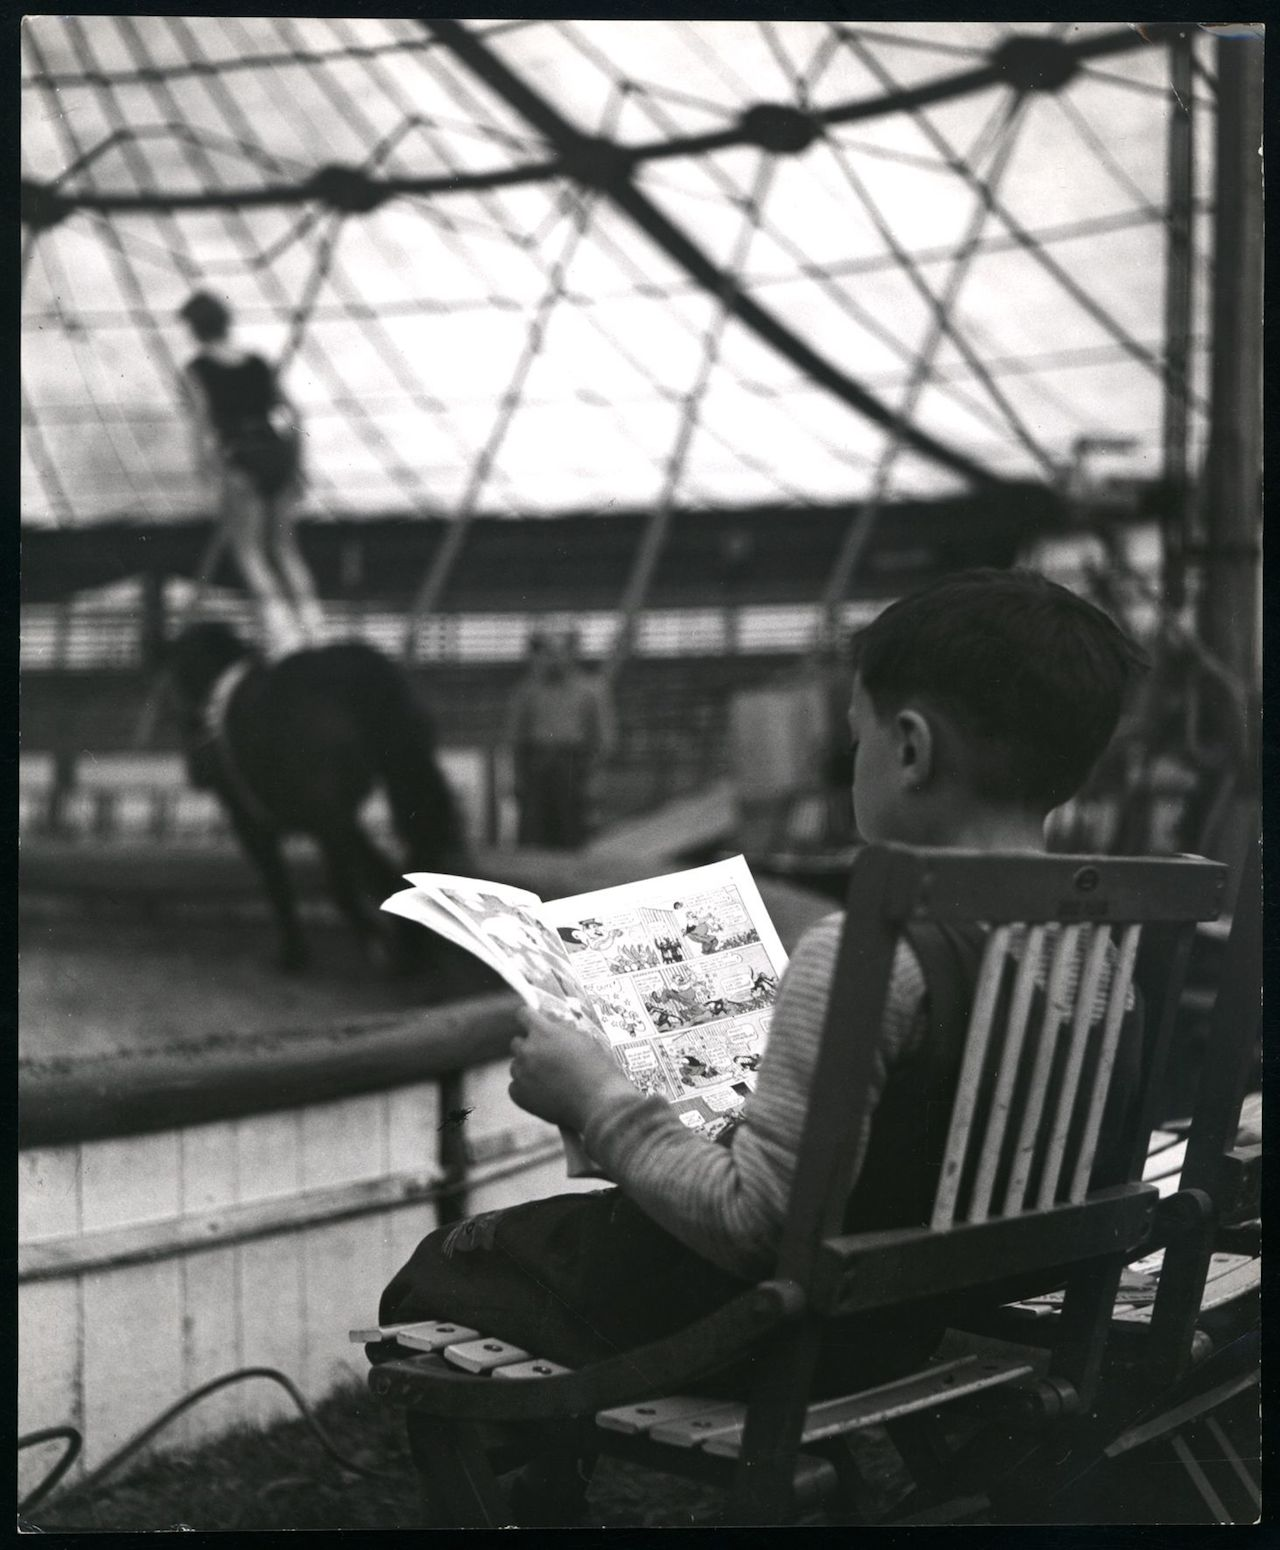 Monique Jacot, Lausanne 1954, Silbergelatineabzug, © Monique Jacot / Fotostiftung Schweiz, Winterthur